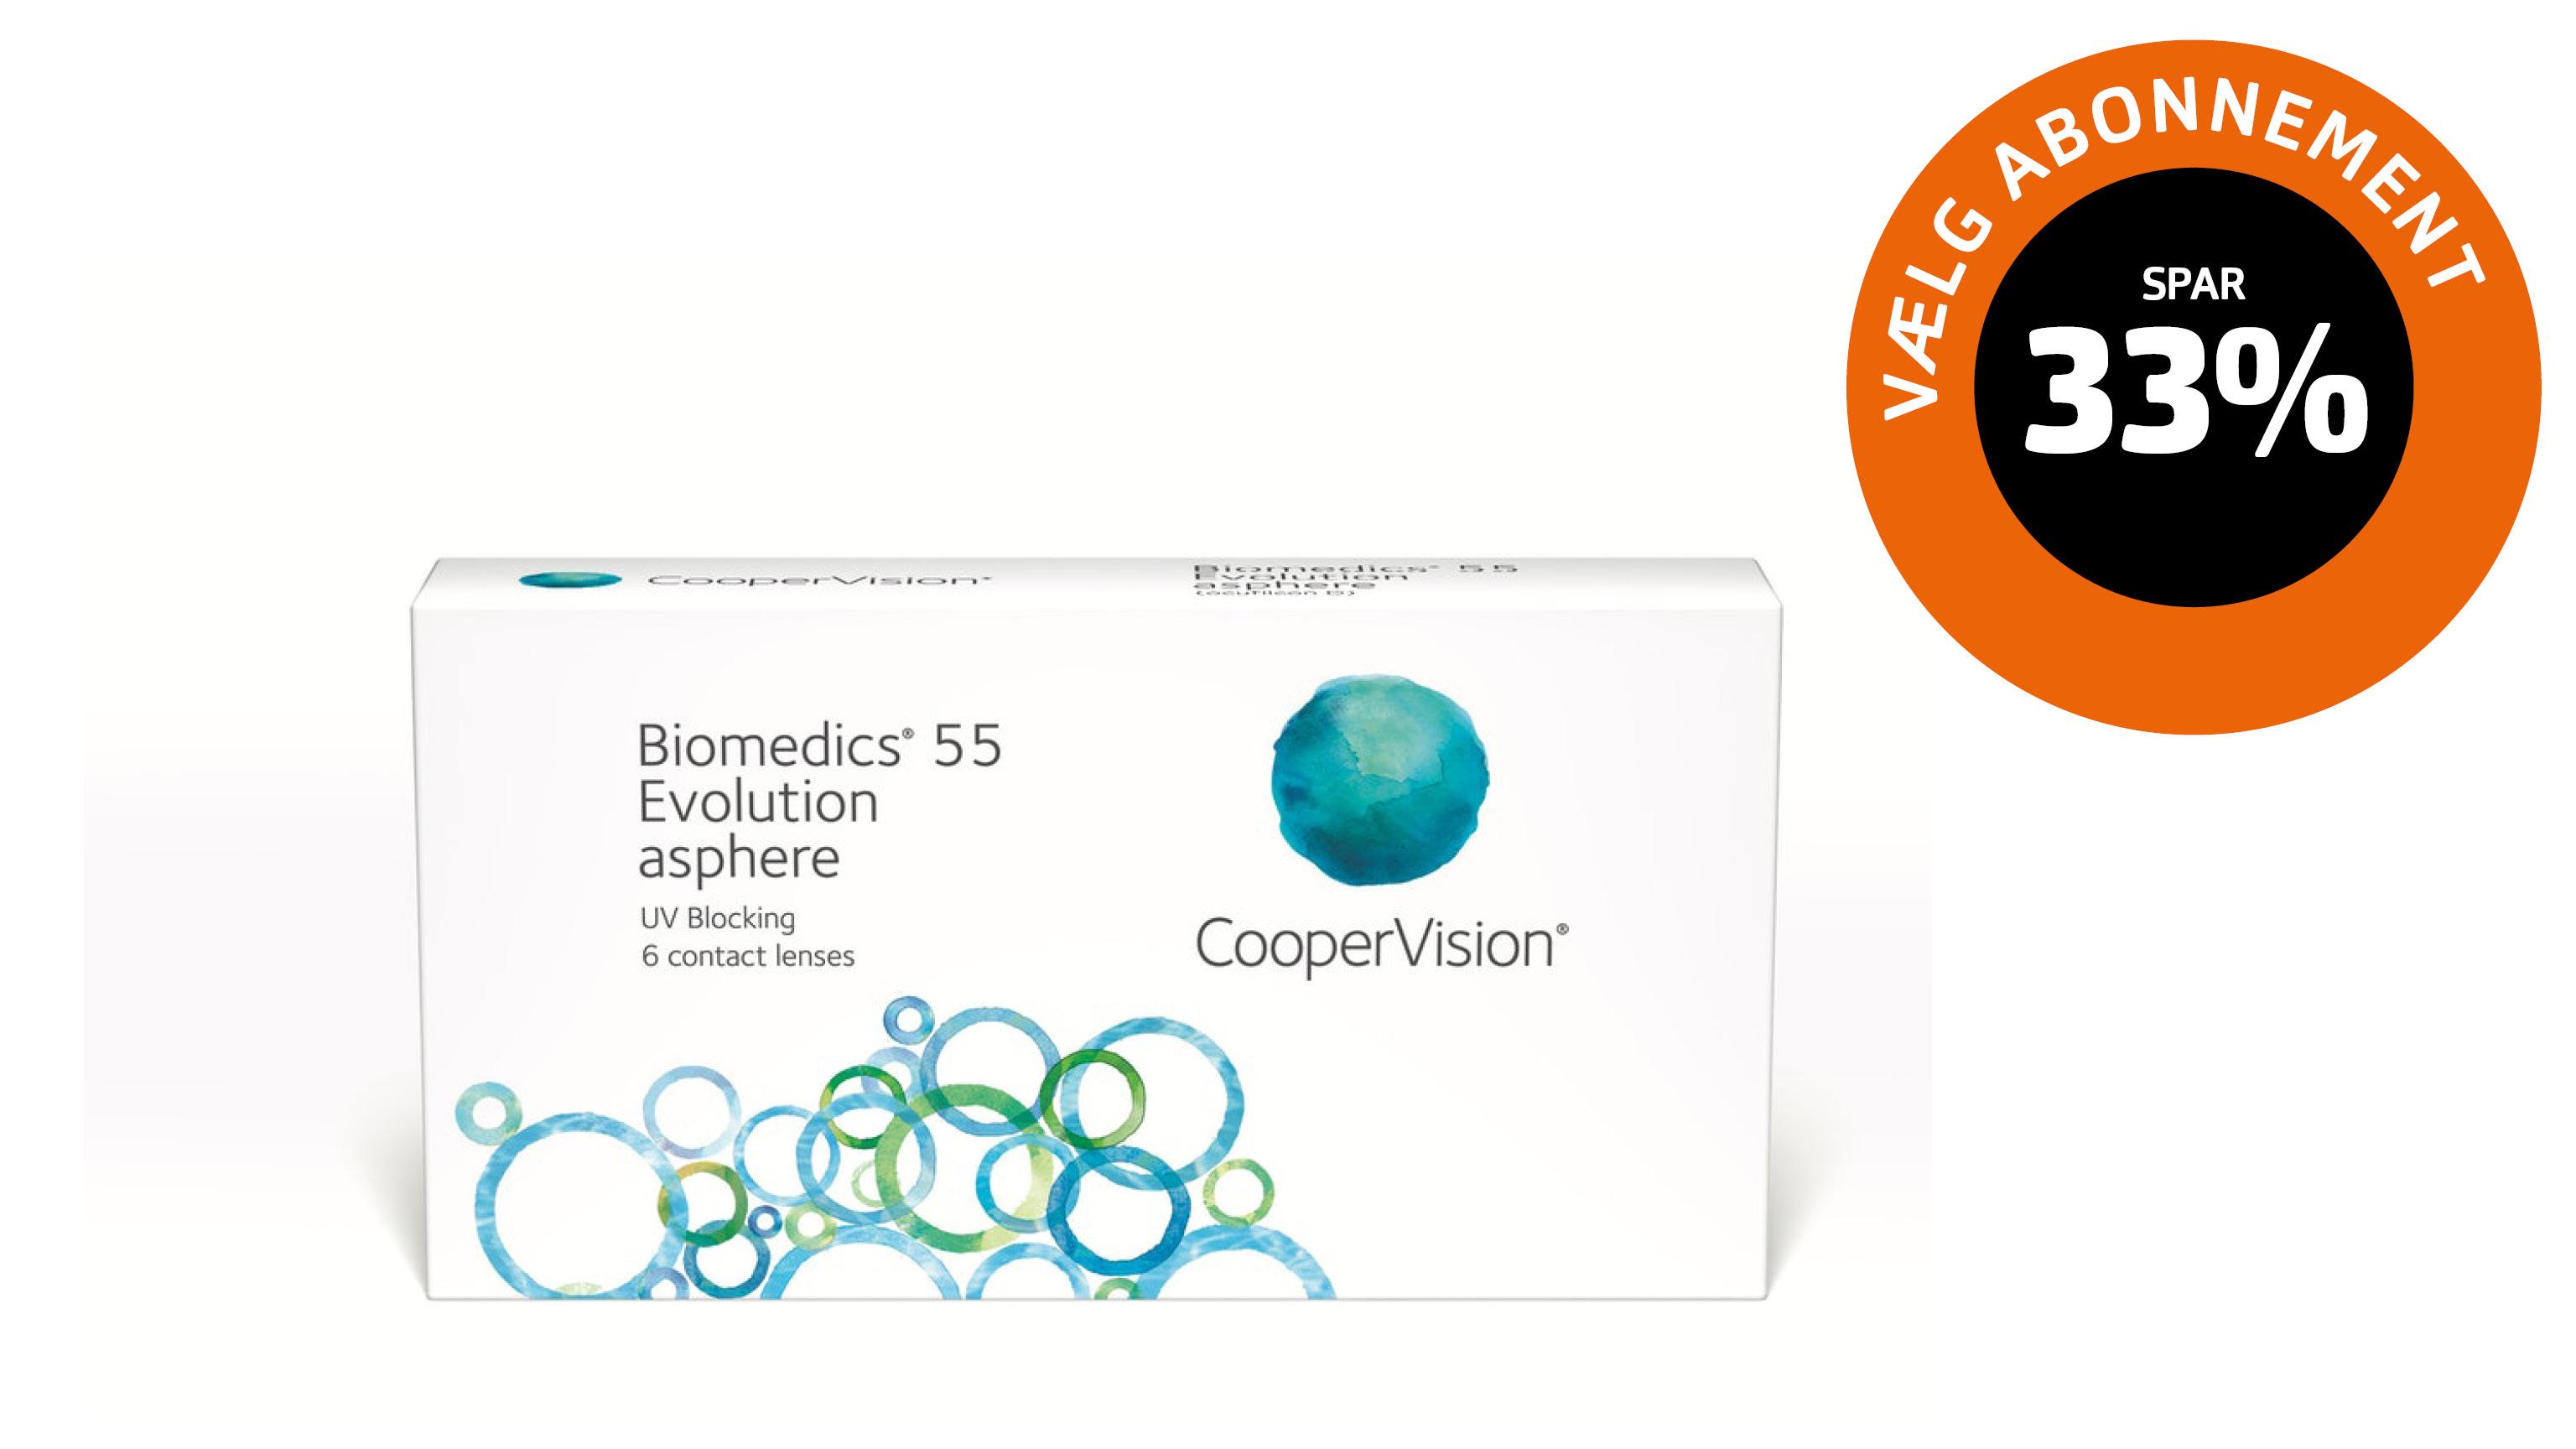 Front Biomedics 55 Evolution